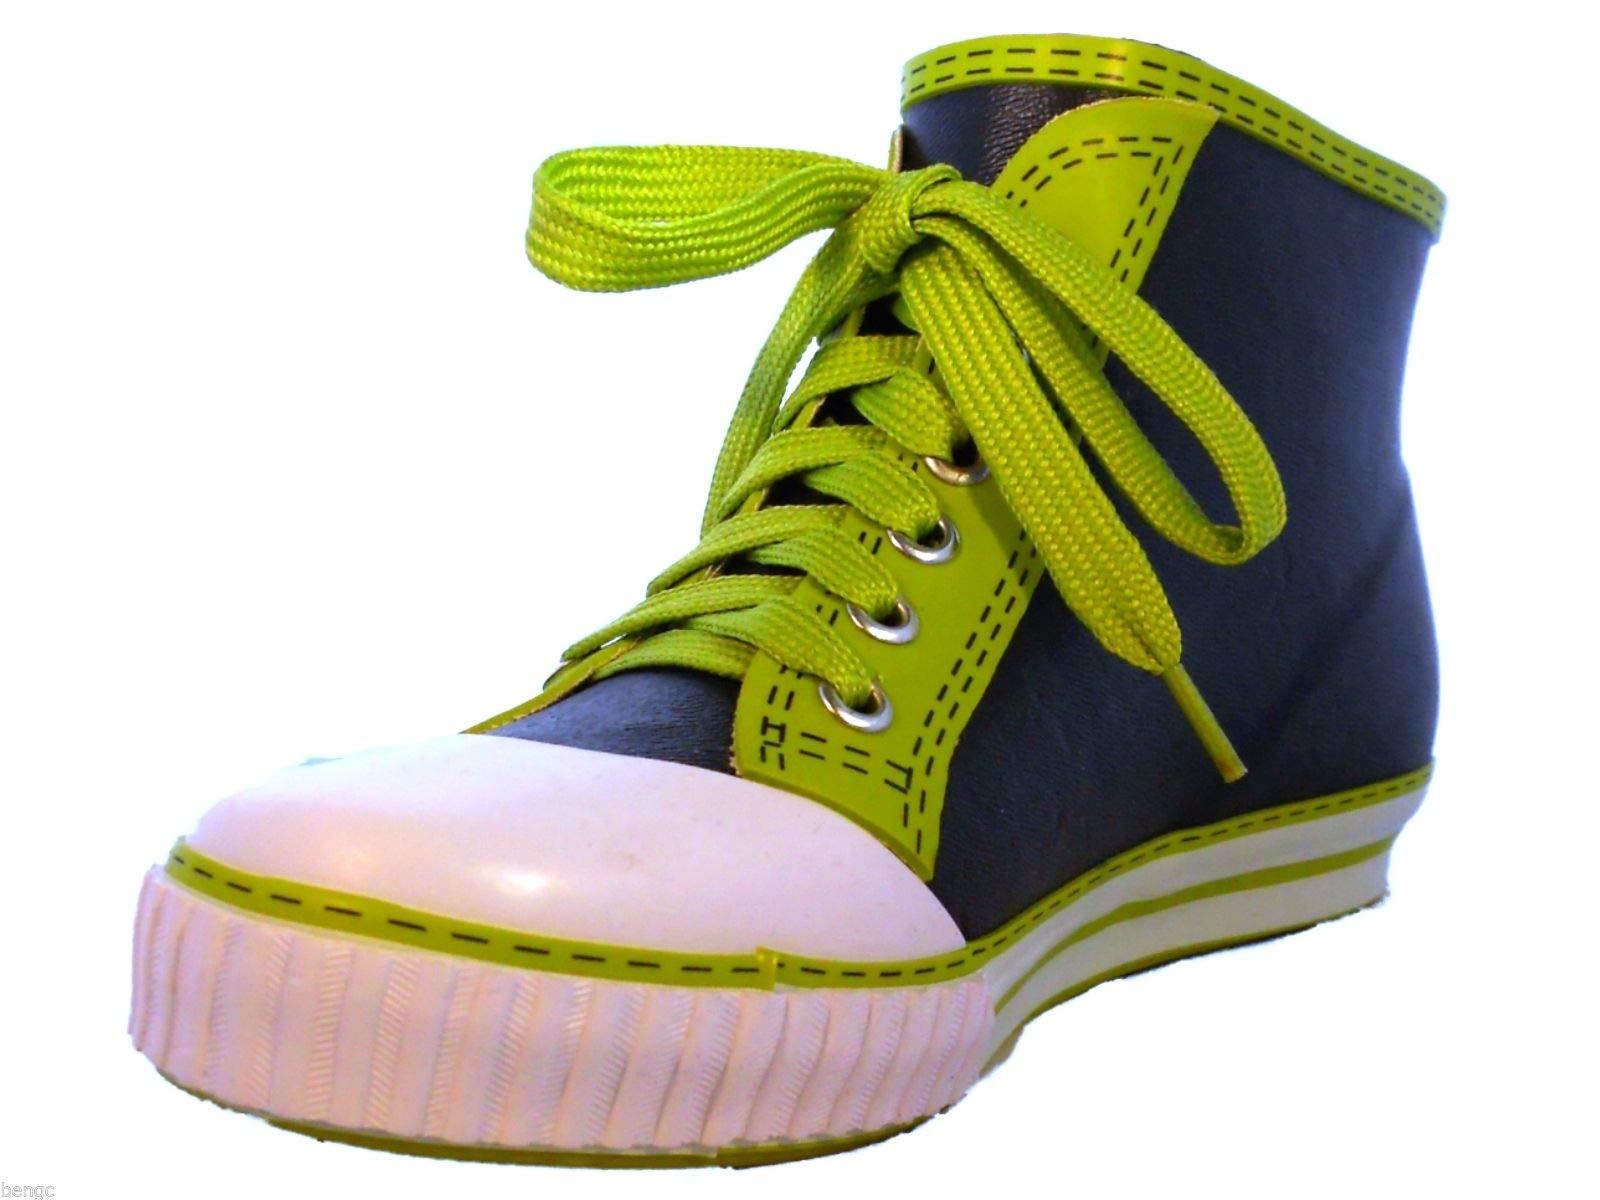 BengC Sneaker Style UNISEX Rain Boots Waterproof Slip On Shoes FITS LARGE